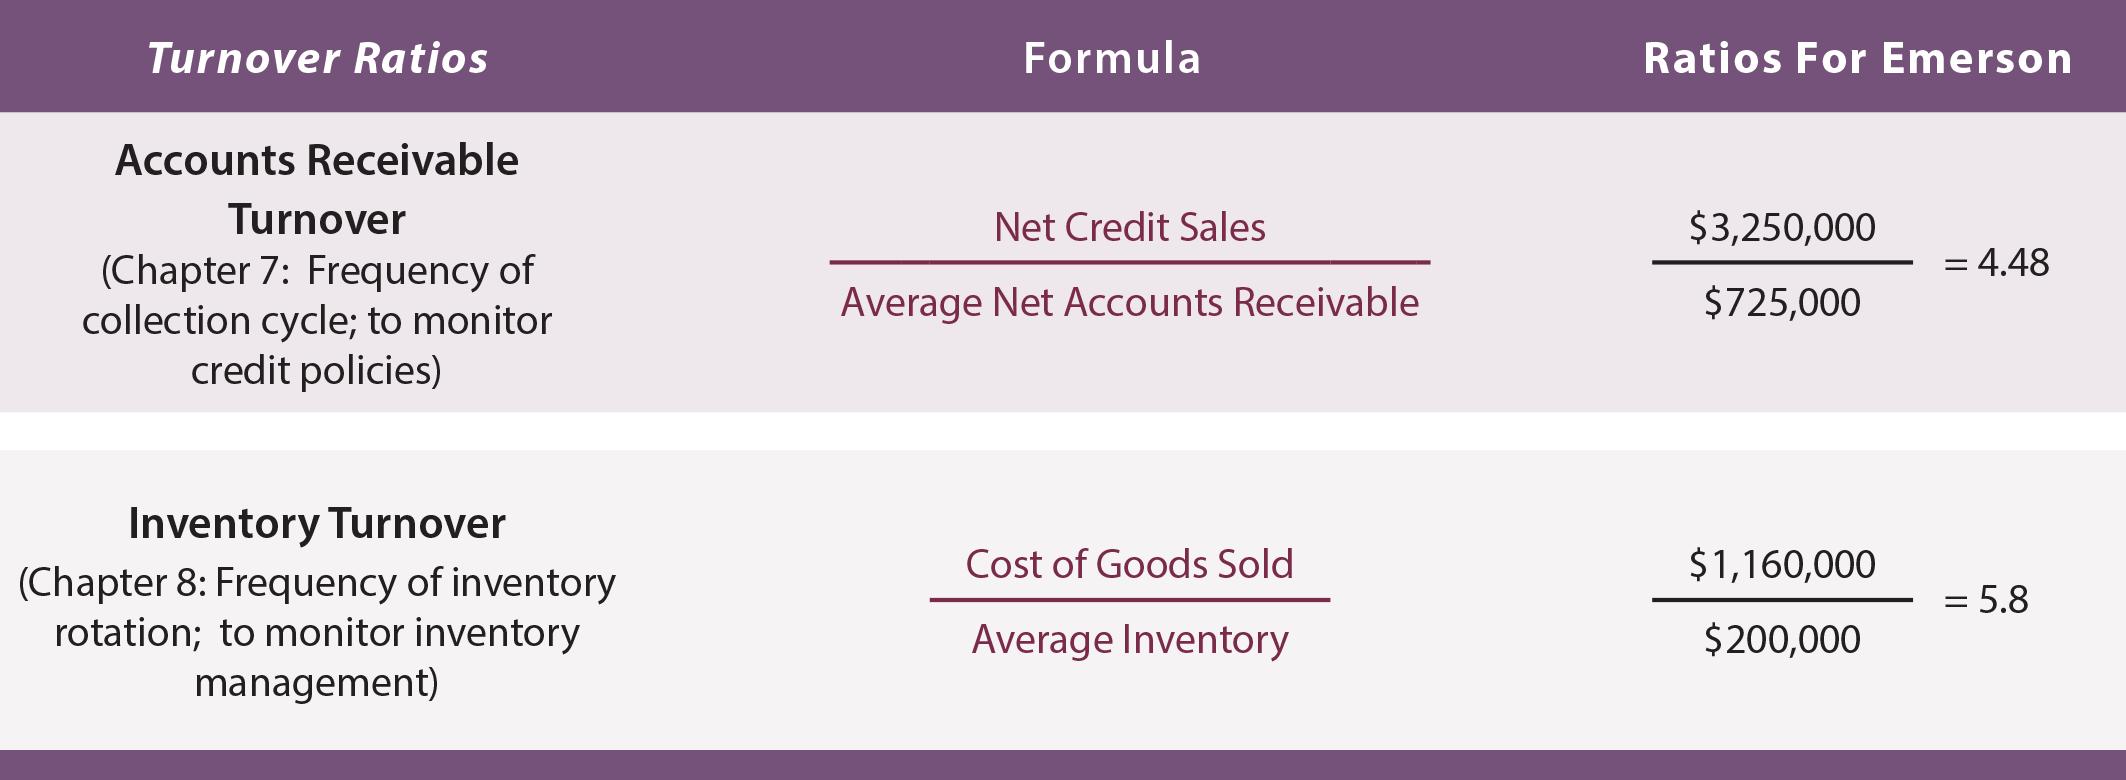 Financial Statement Analysis - Turnover Ratios